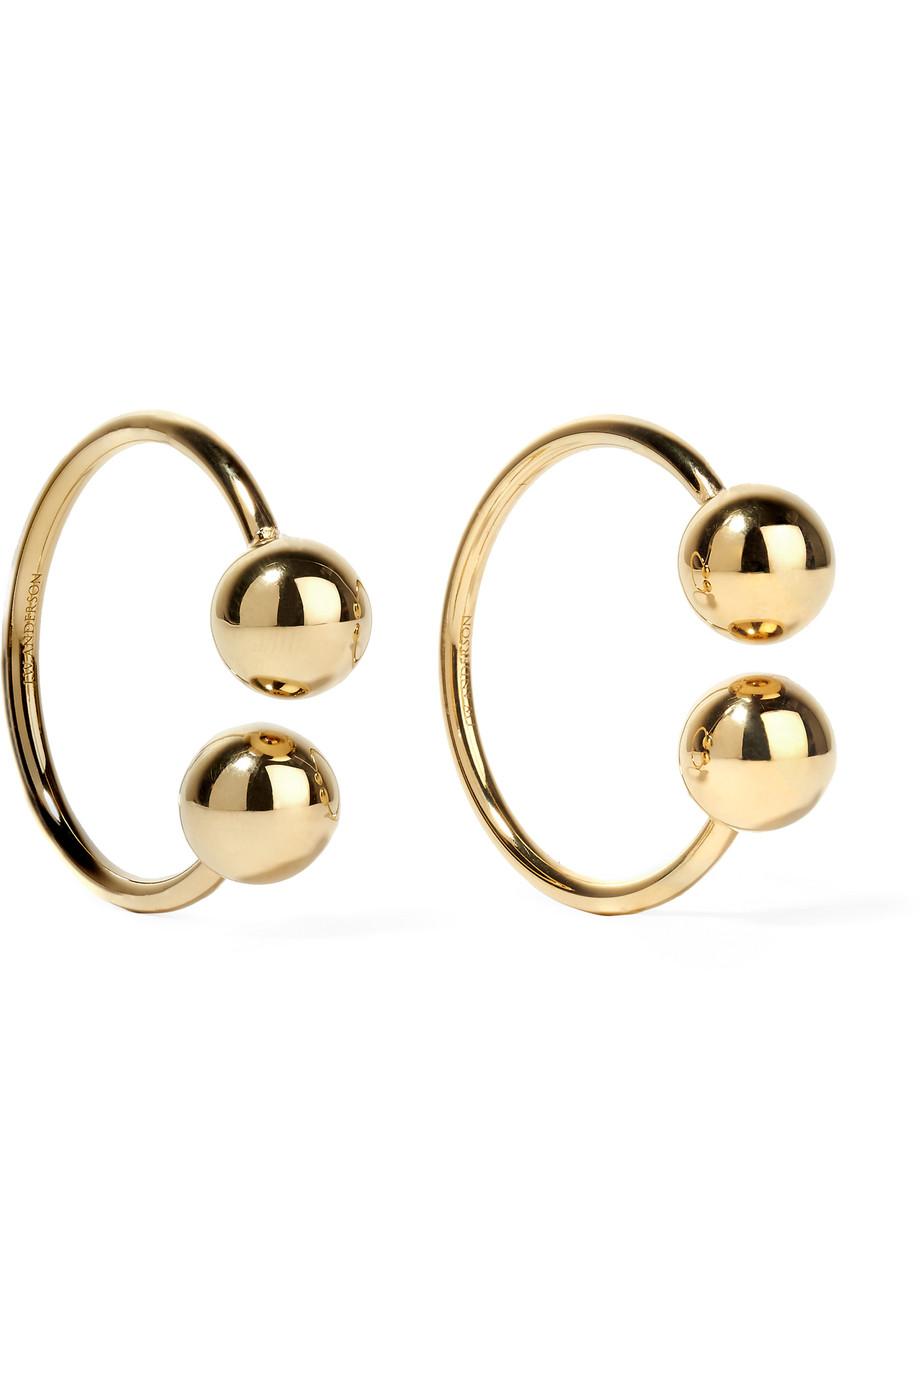 J.W.Anderson Gold-Plated Embellished Hoop Earrings